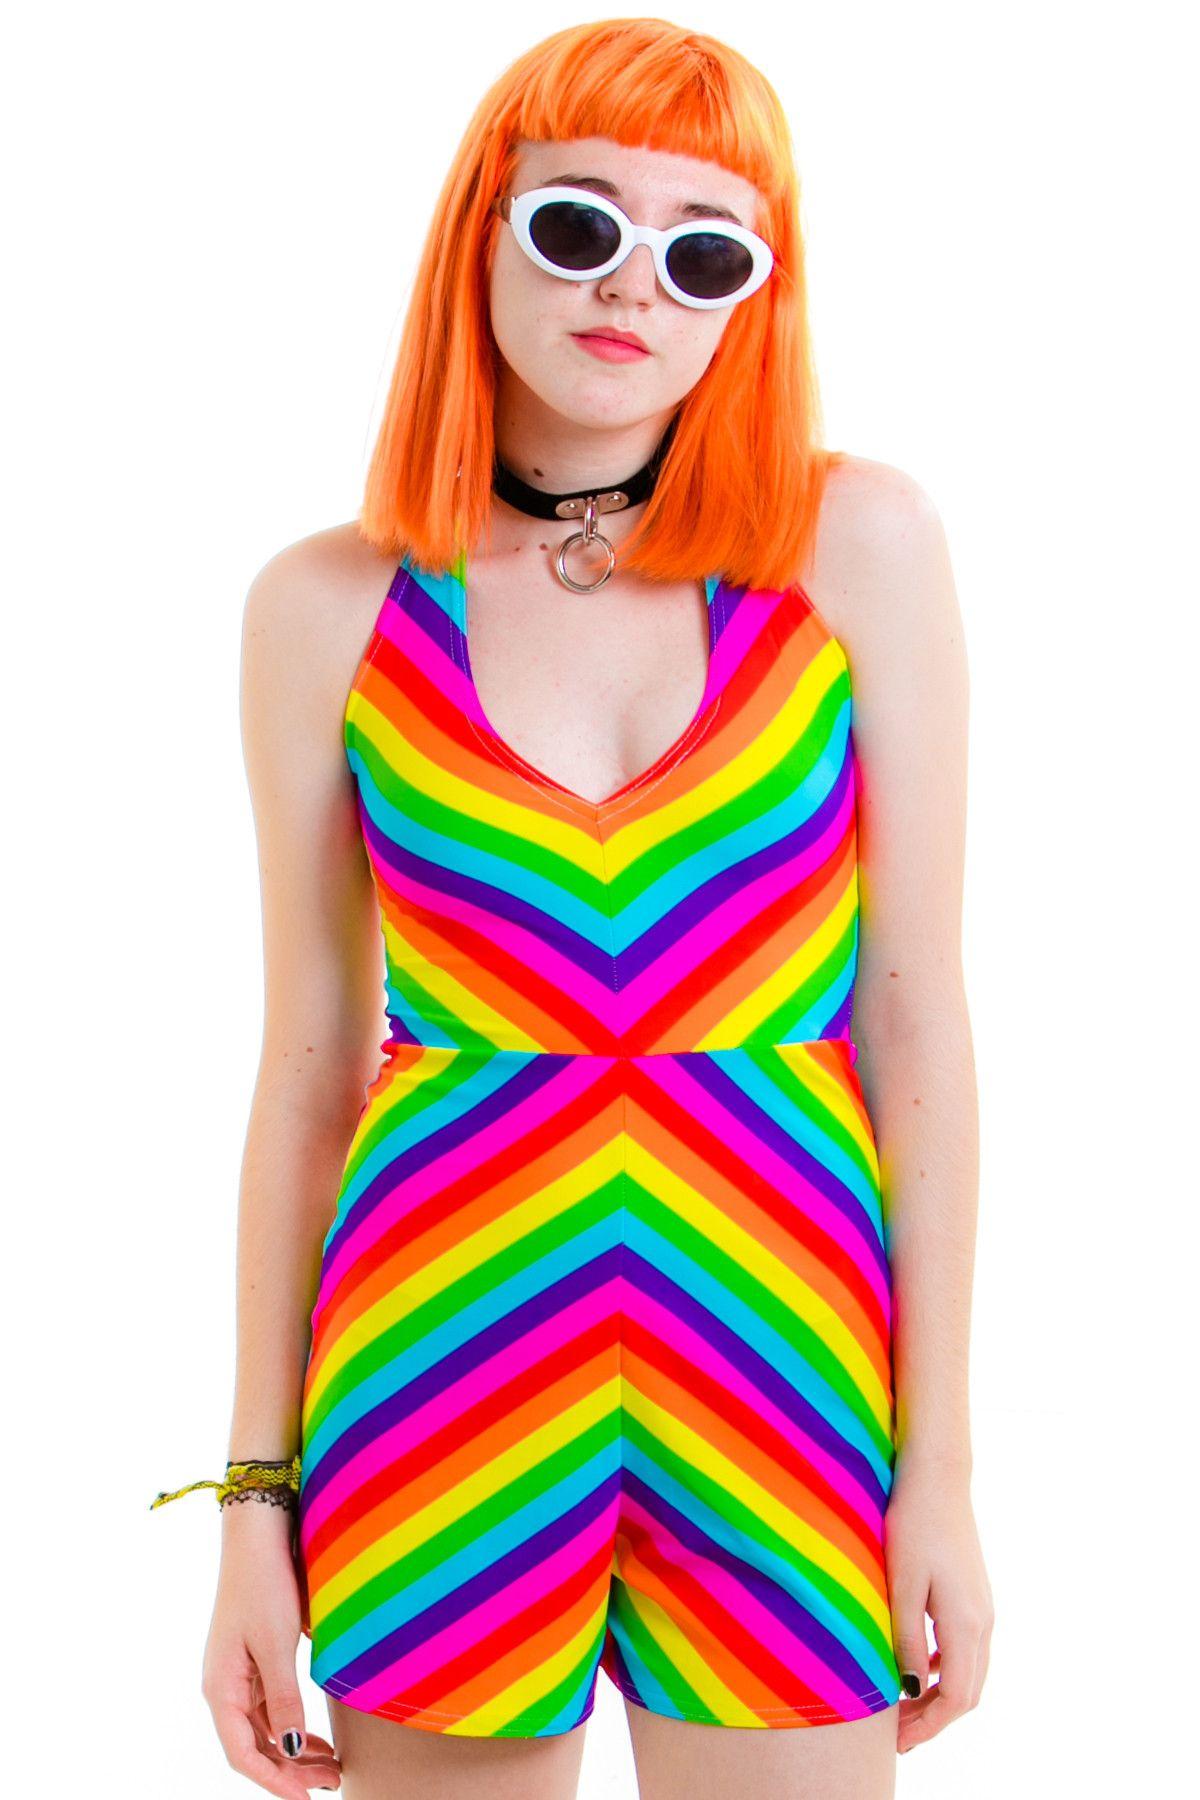 Candy Stripe Playsuit Want Rainbow Fashion Striped